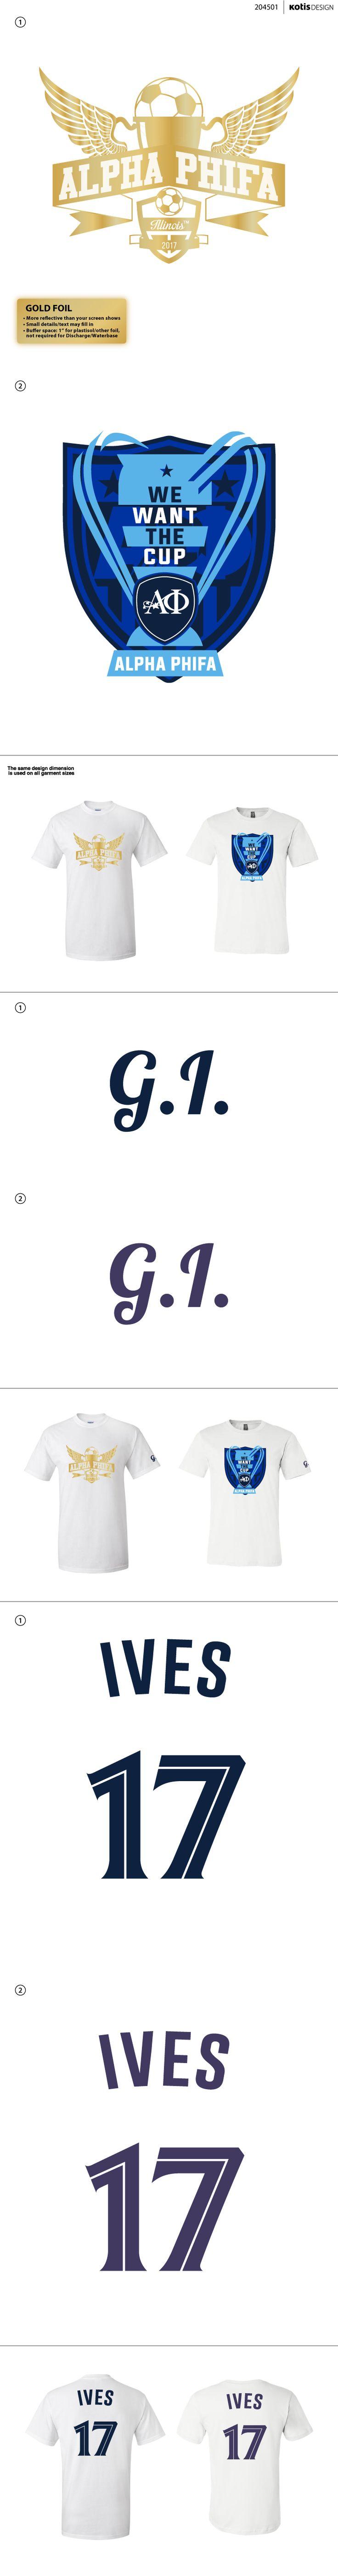 Uiuc Sports T Shirt Designs